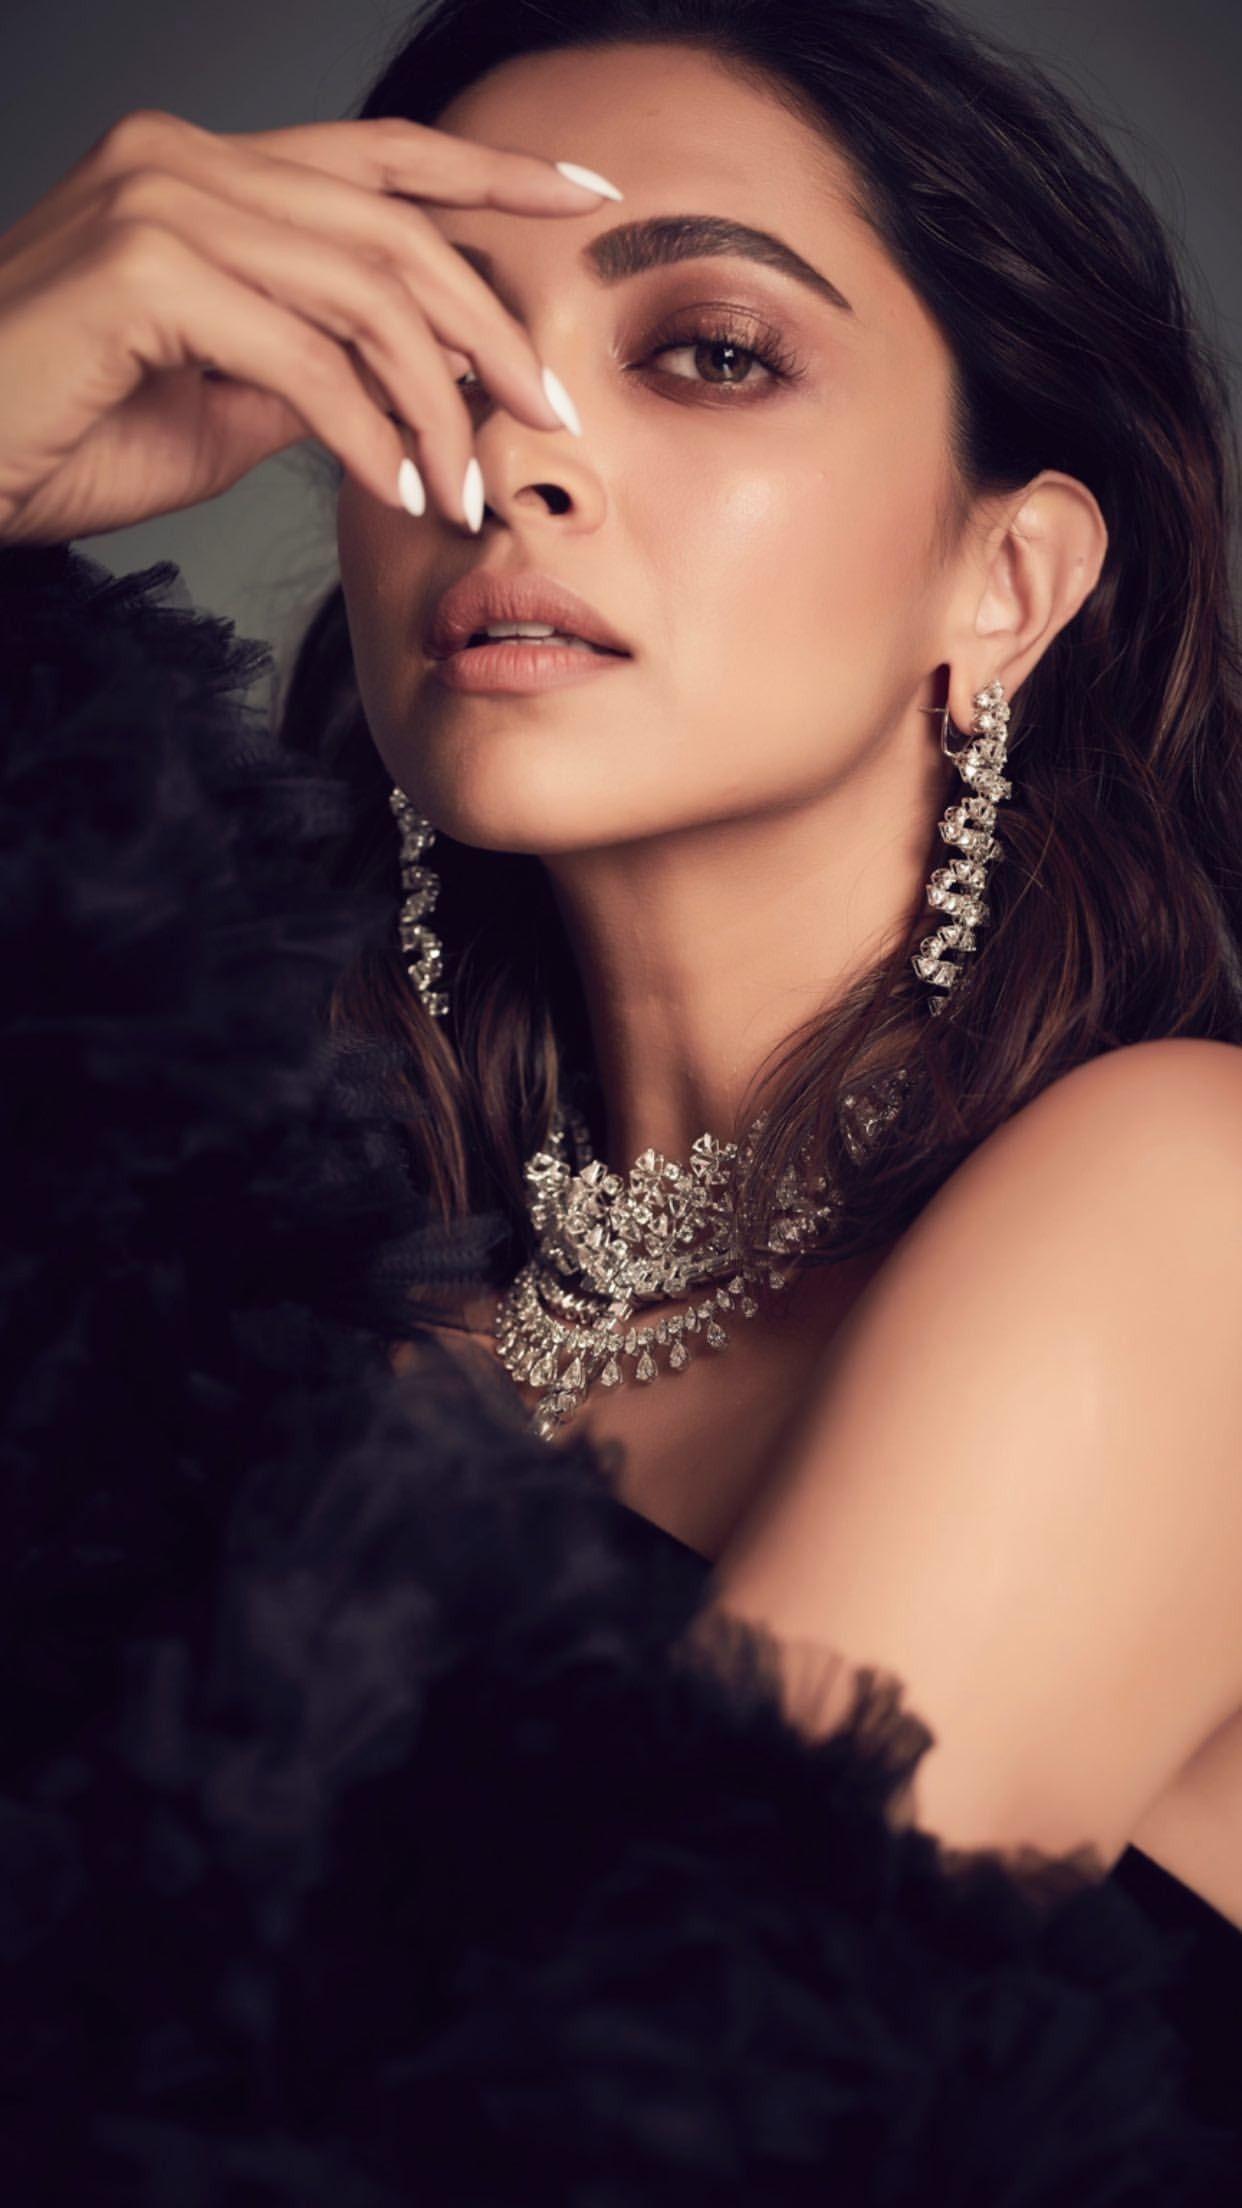 Pin By Anne Boleyn On Queen Deepika Padukone Deepika Padukone Glam Photoshoot Beauty